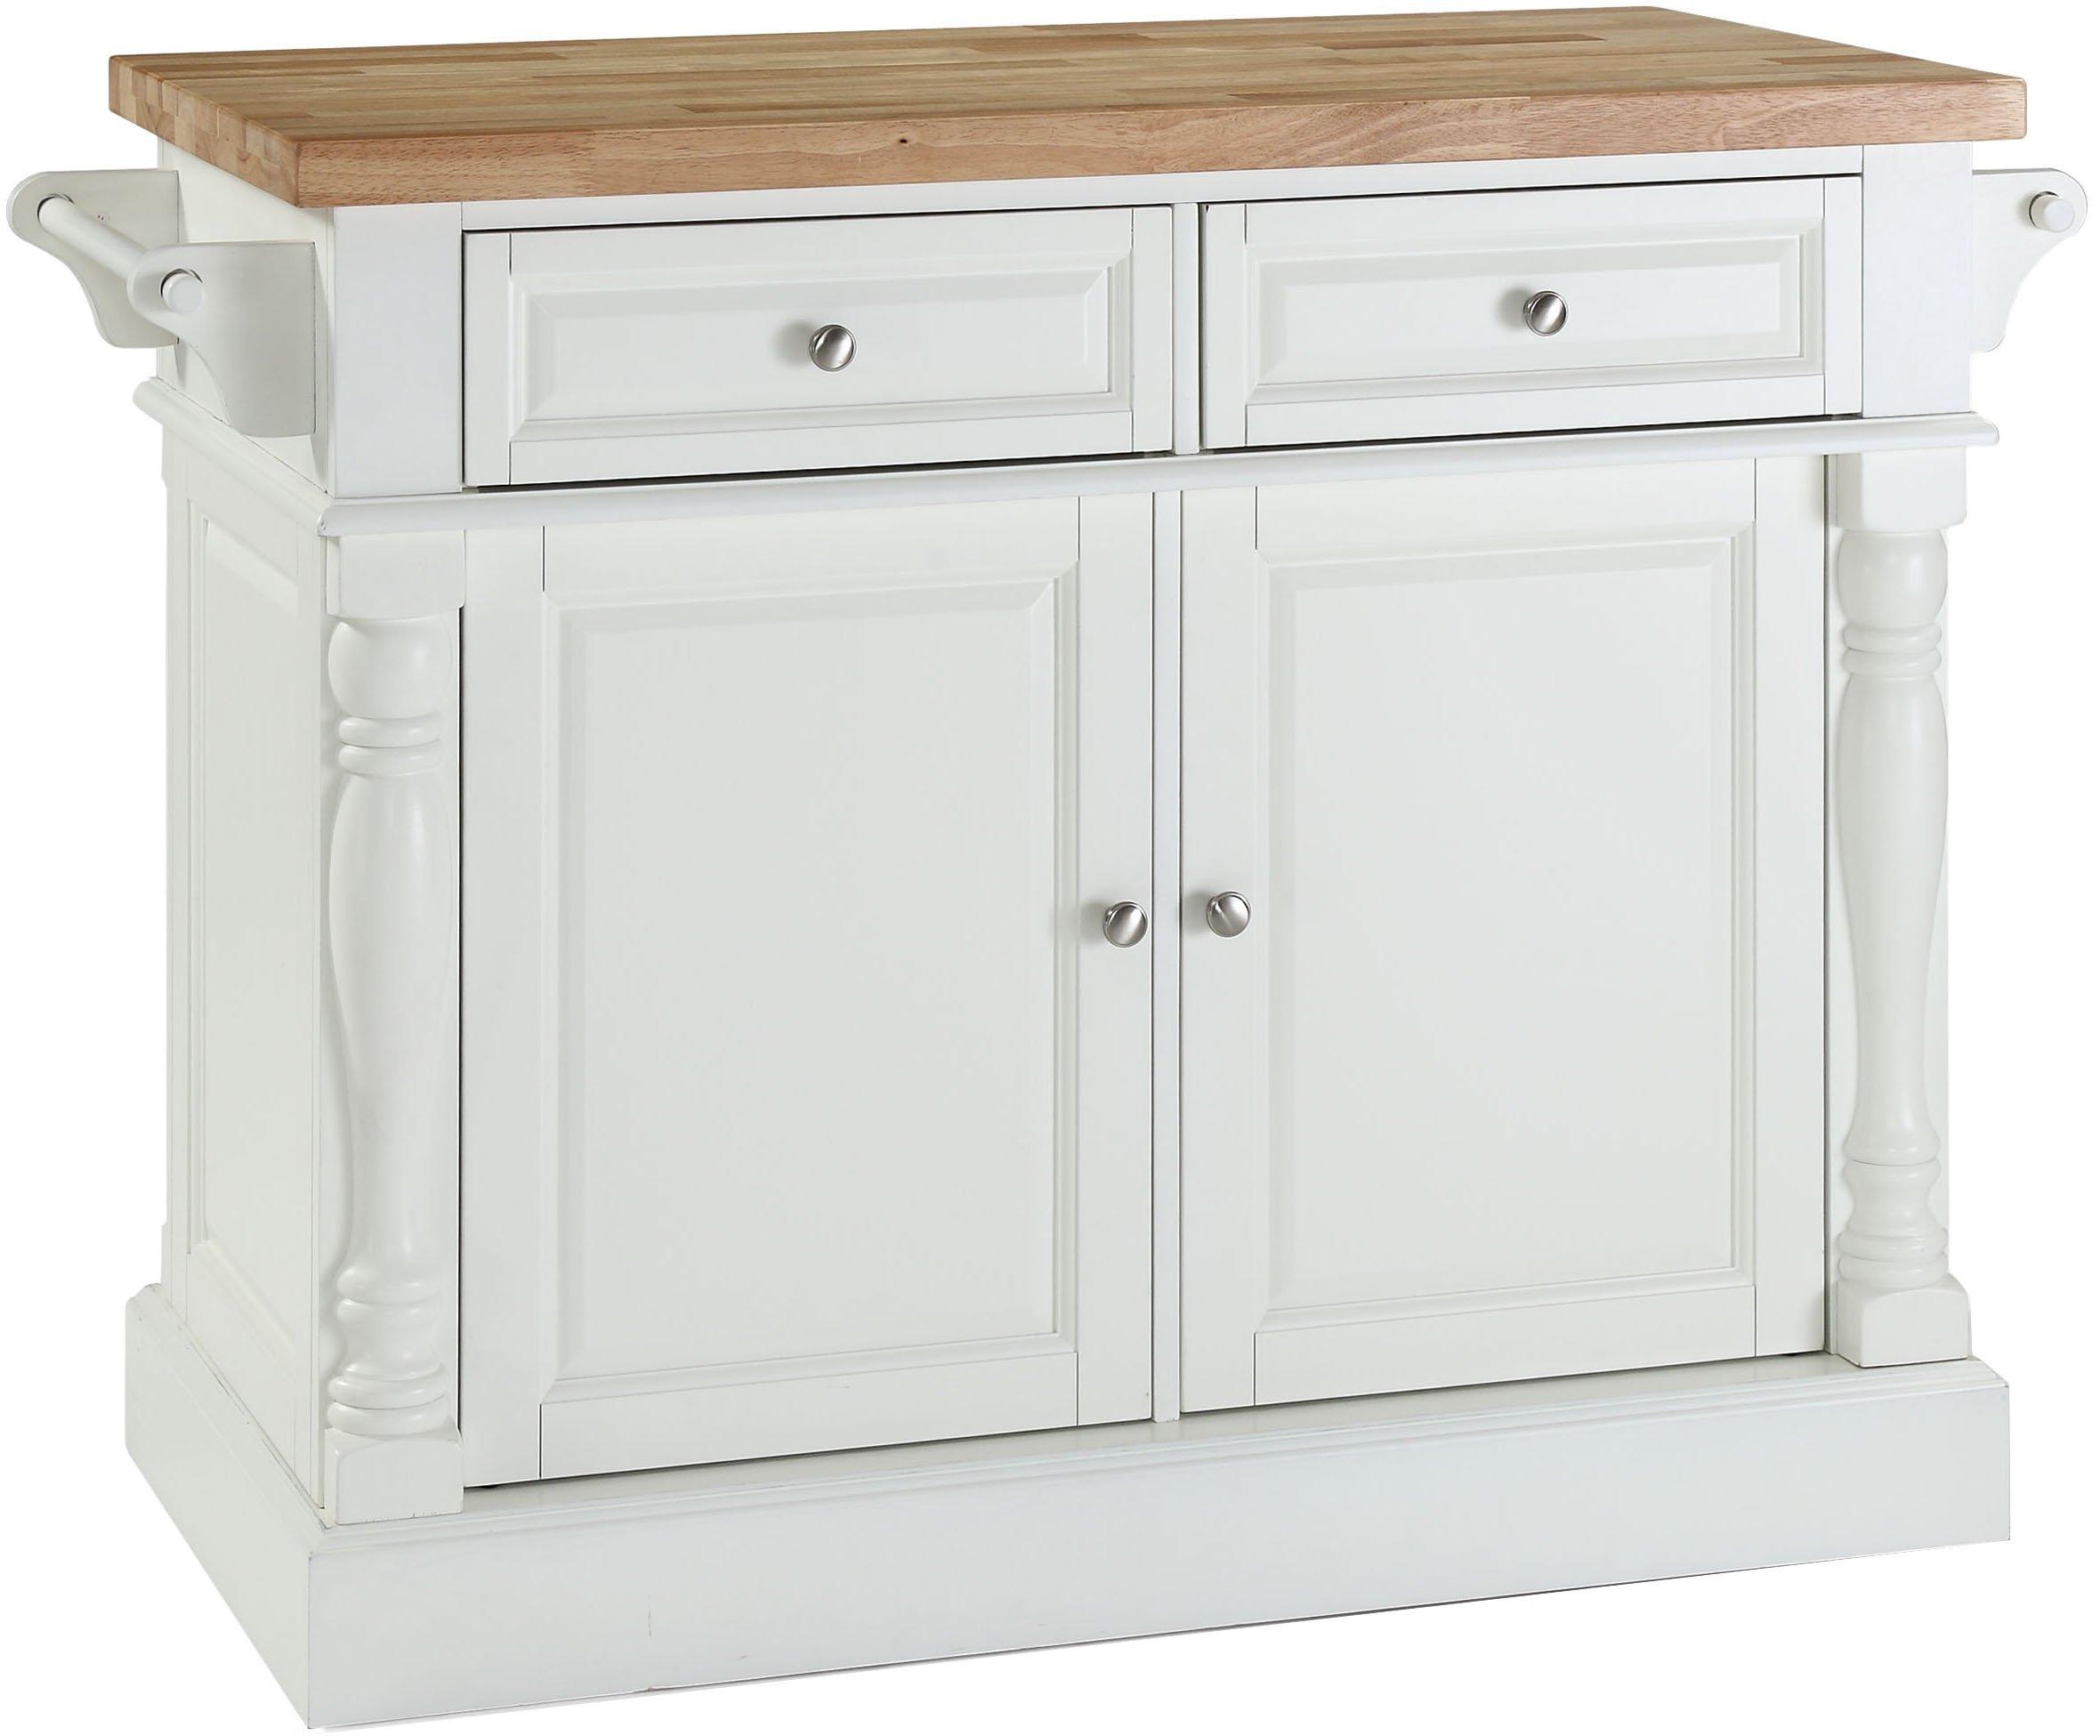 Crosley Furniture Kitchen Island with Butcher Block Top - White by Crosley Furniture (Image #1)